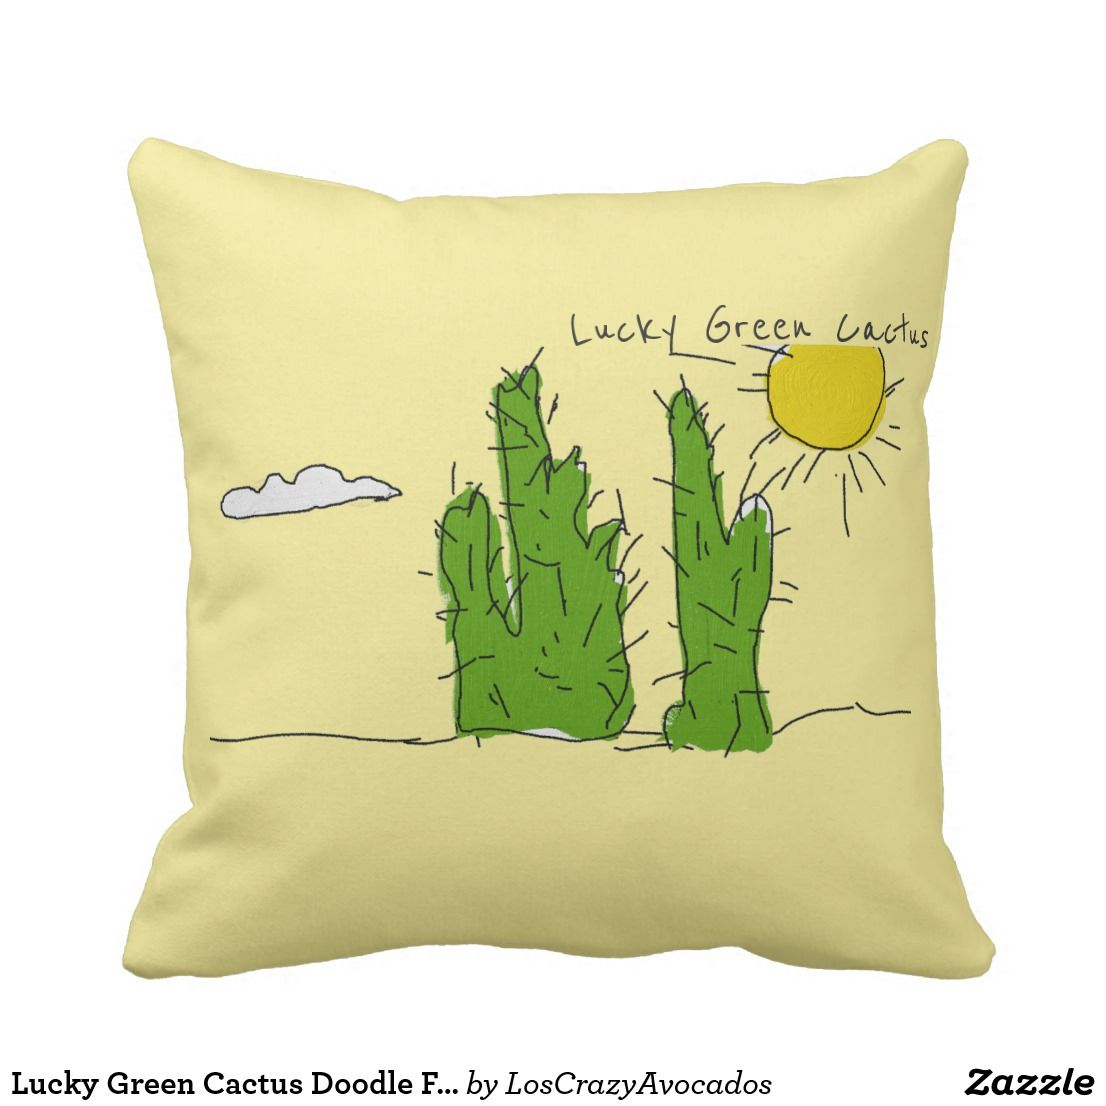 Lucky Green Cactus Doodle Funky Throw Pillow | Pillows / Cushions ...